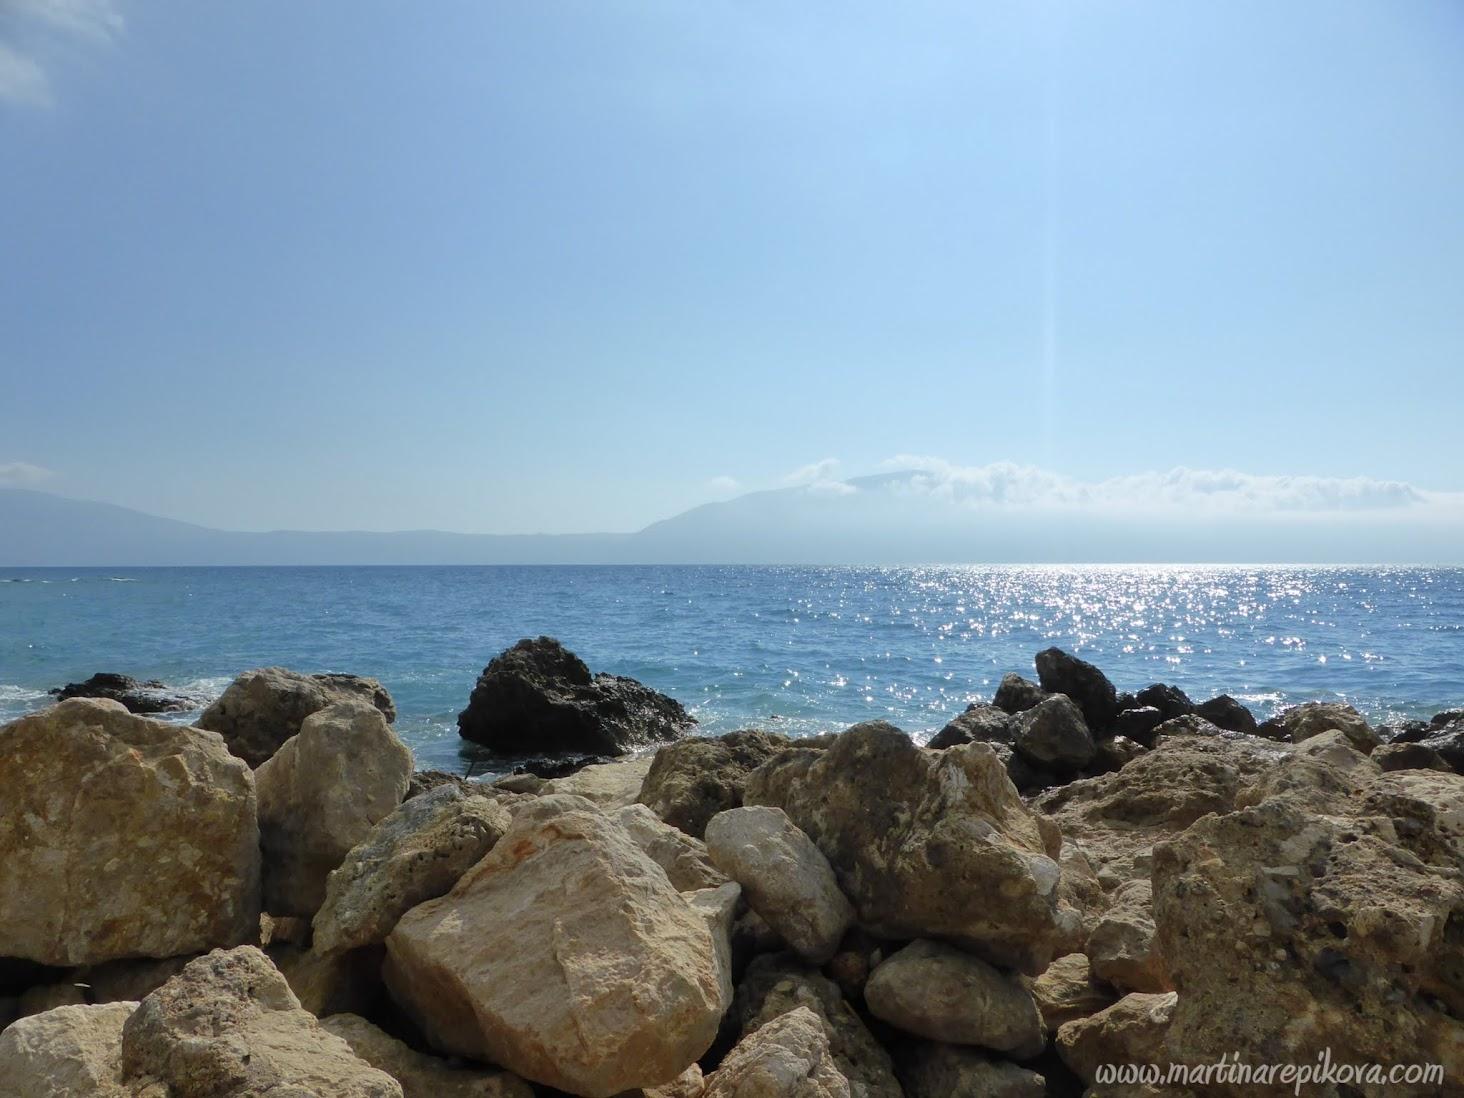 Iionian sea, Albania